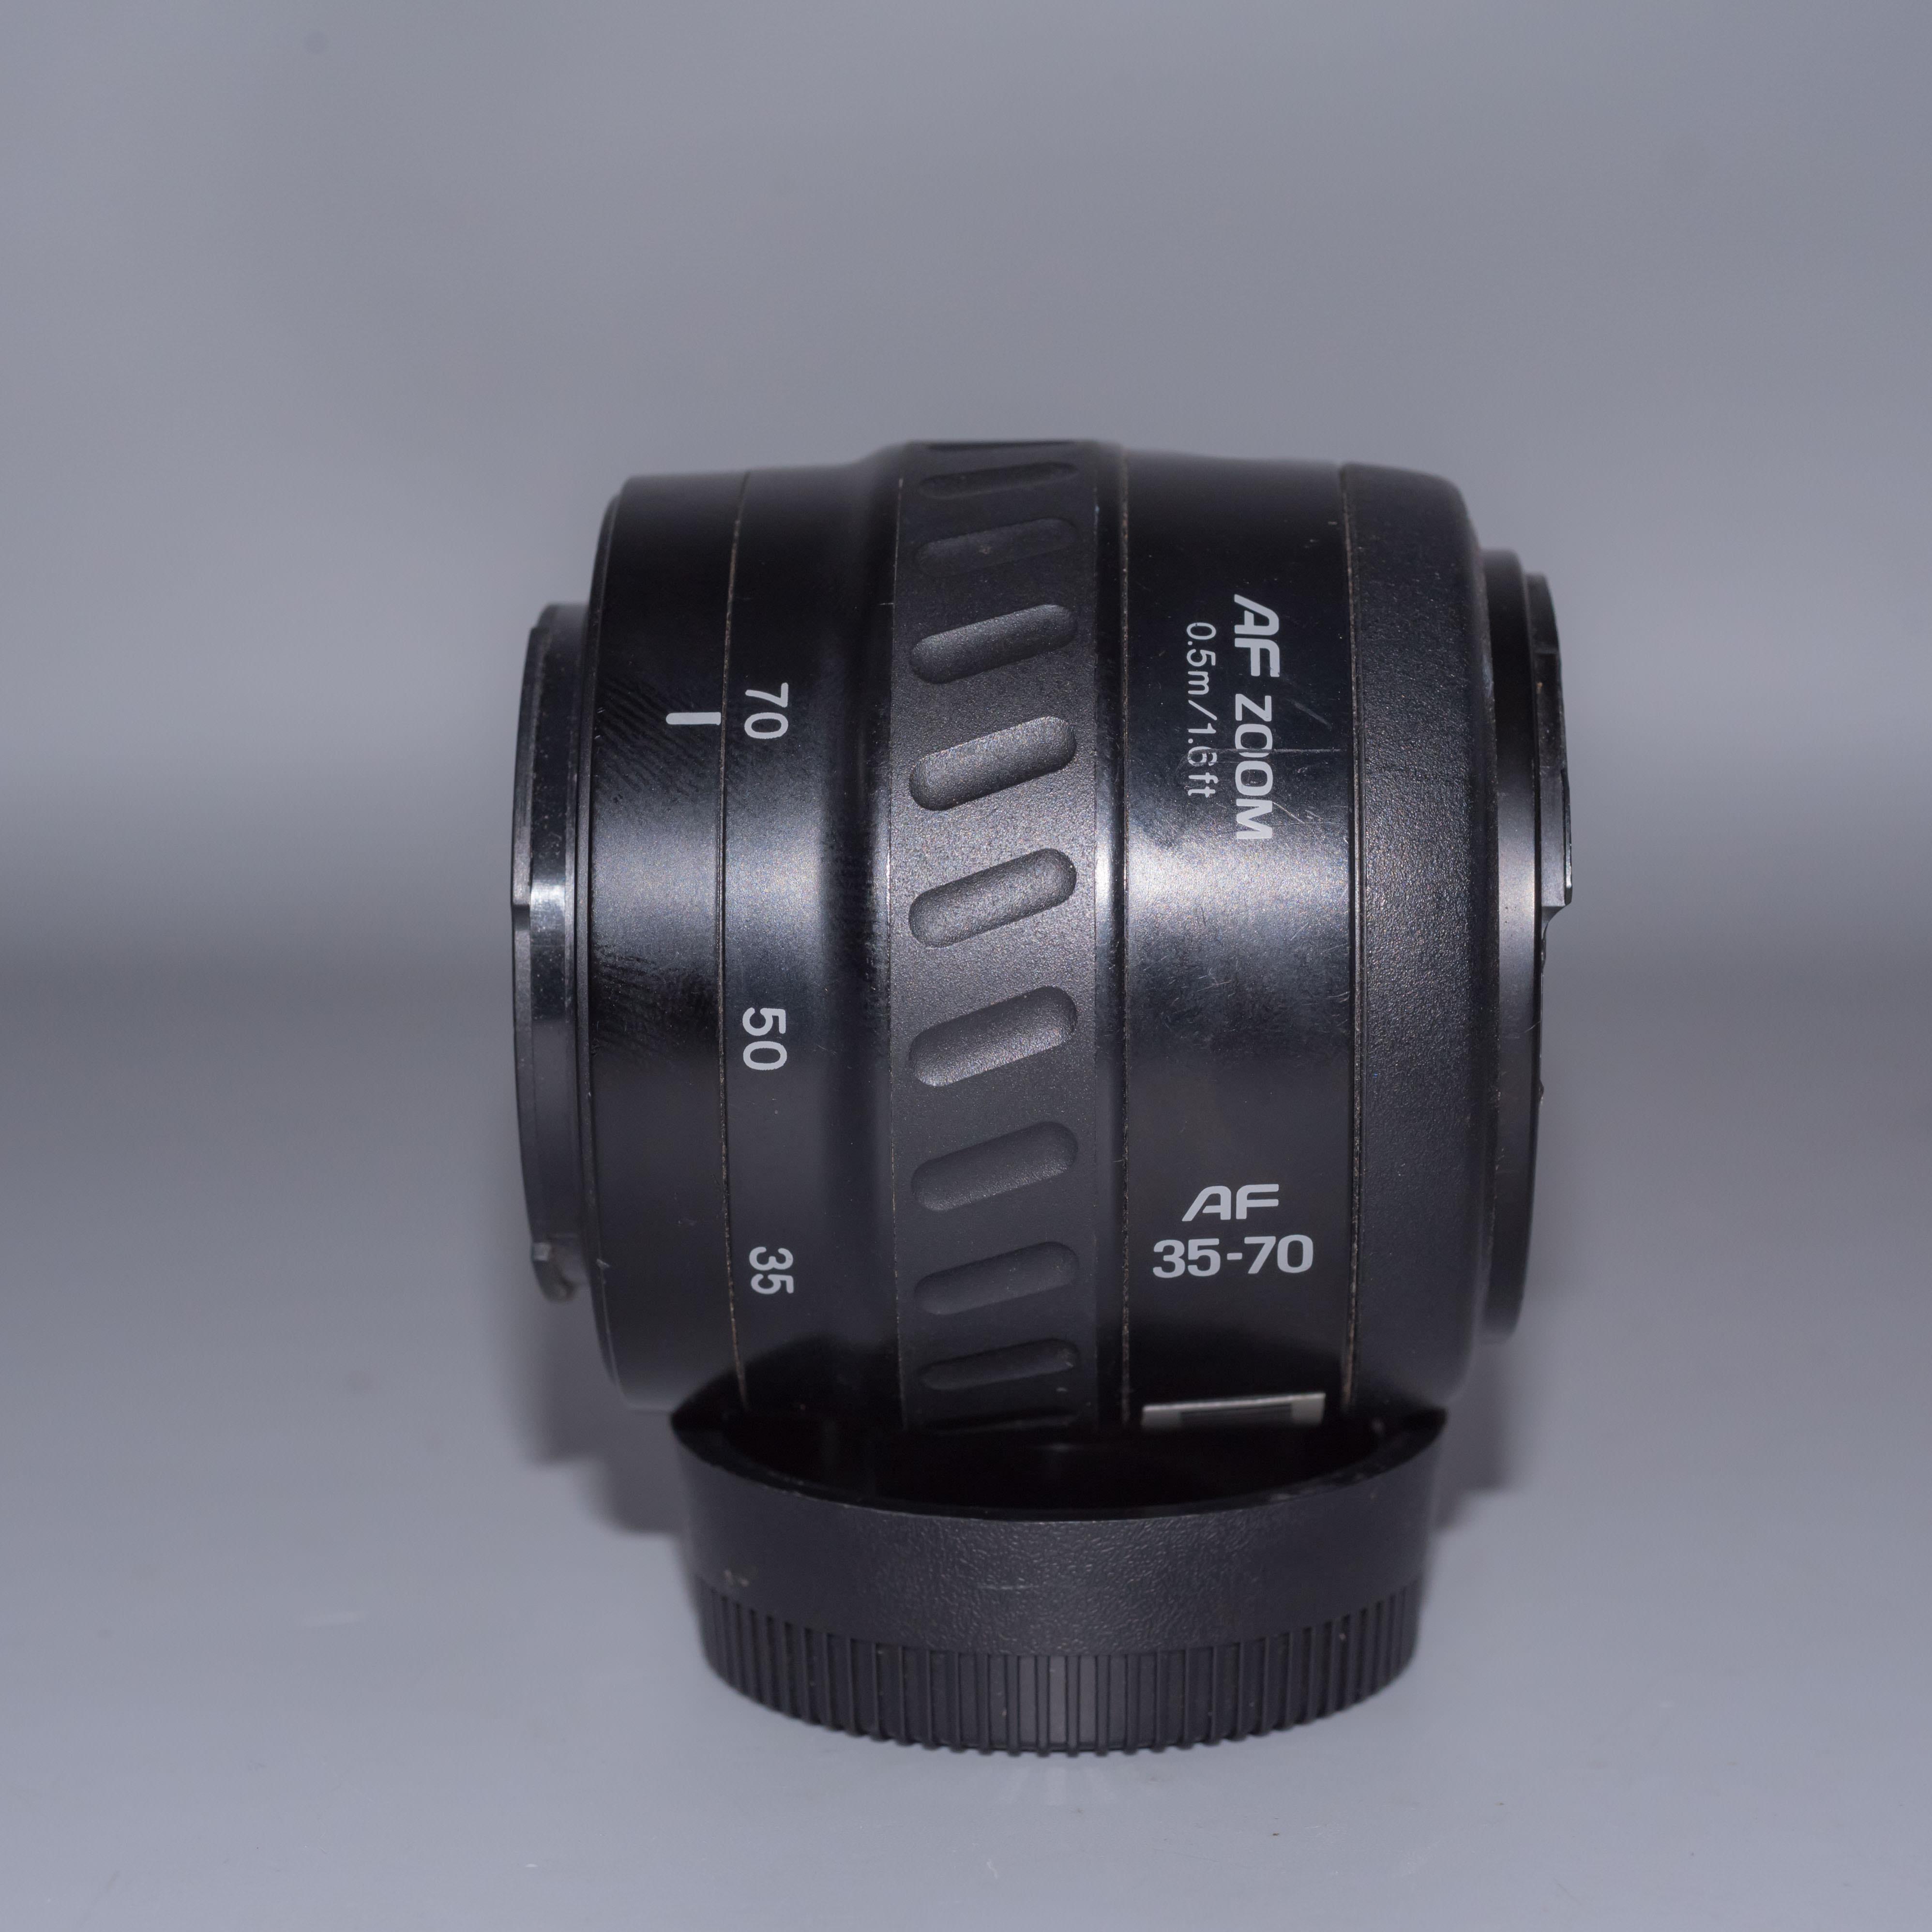 minolta-35-70mm-f3-5-4-5-af-sony-a-35-70-3-5-4-5-10406